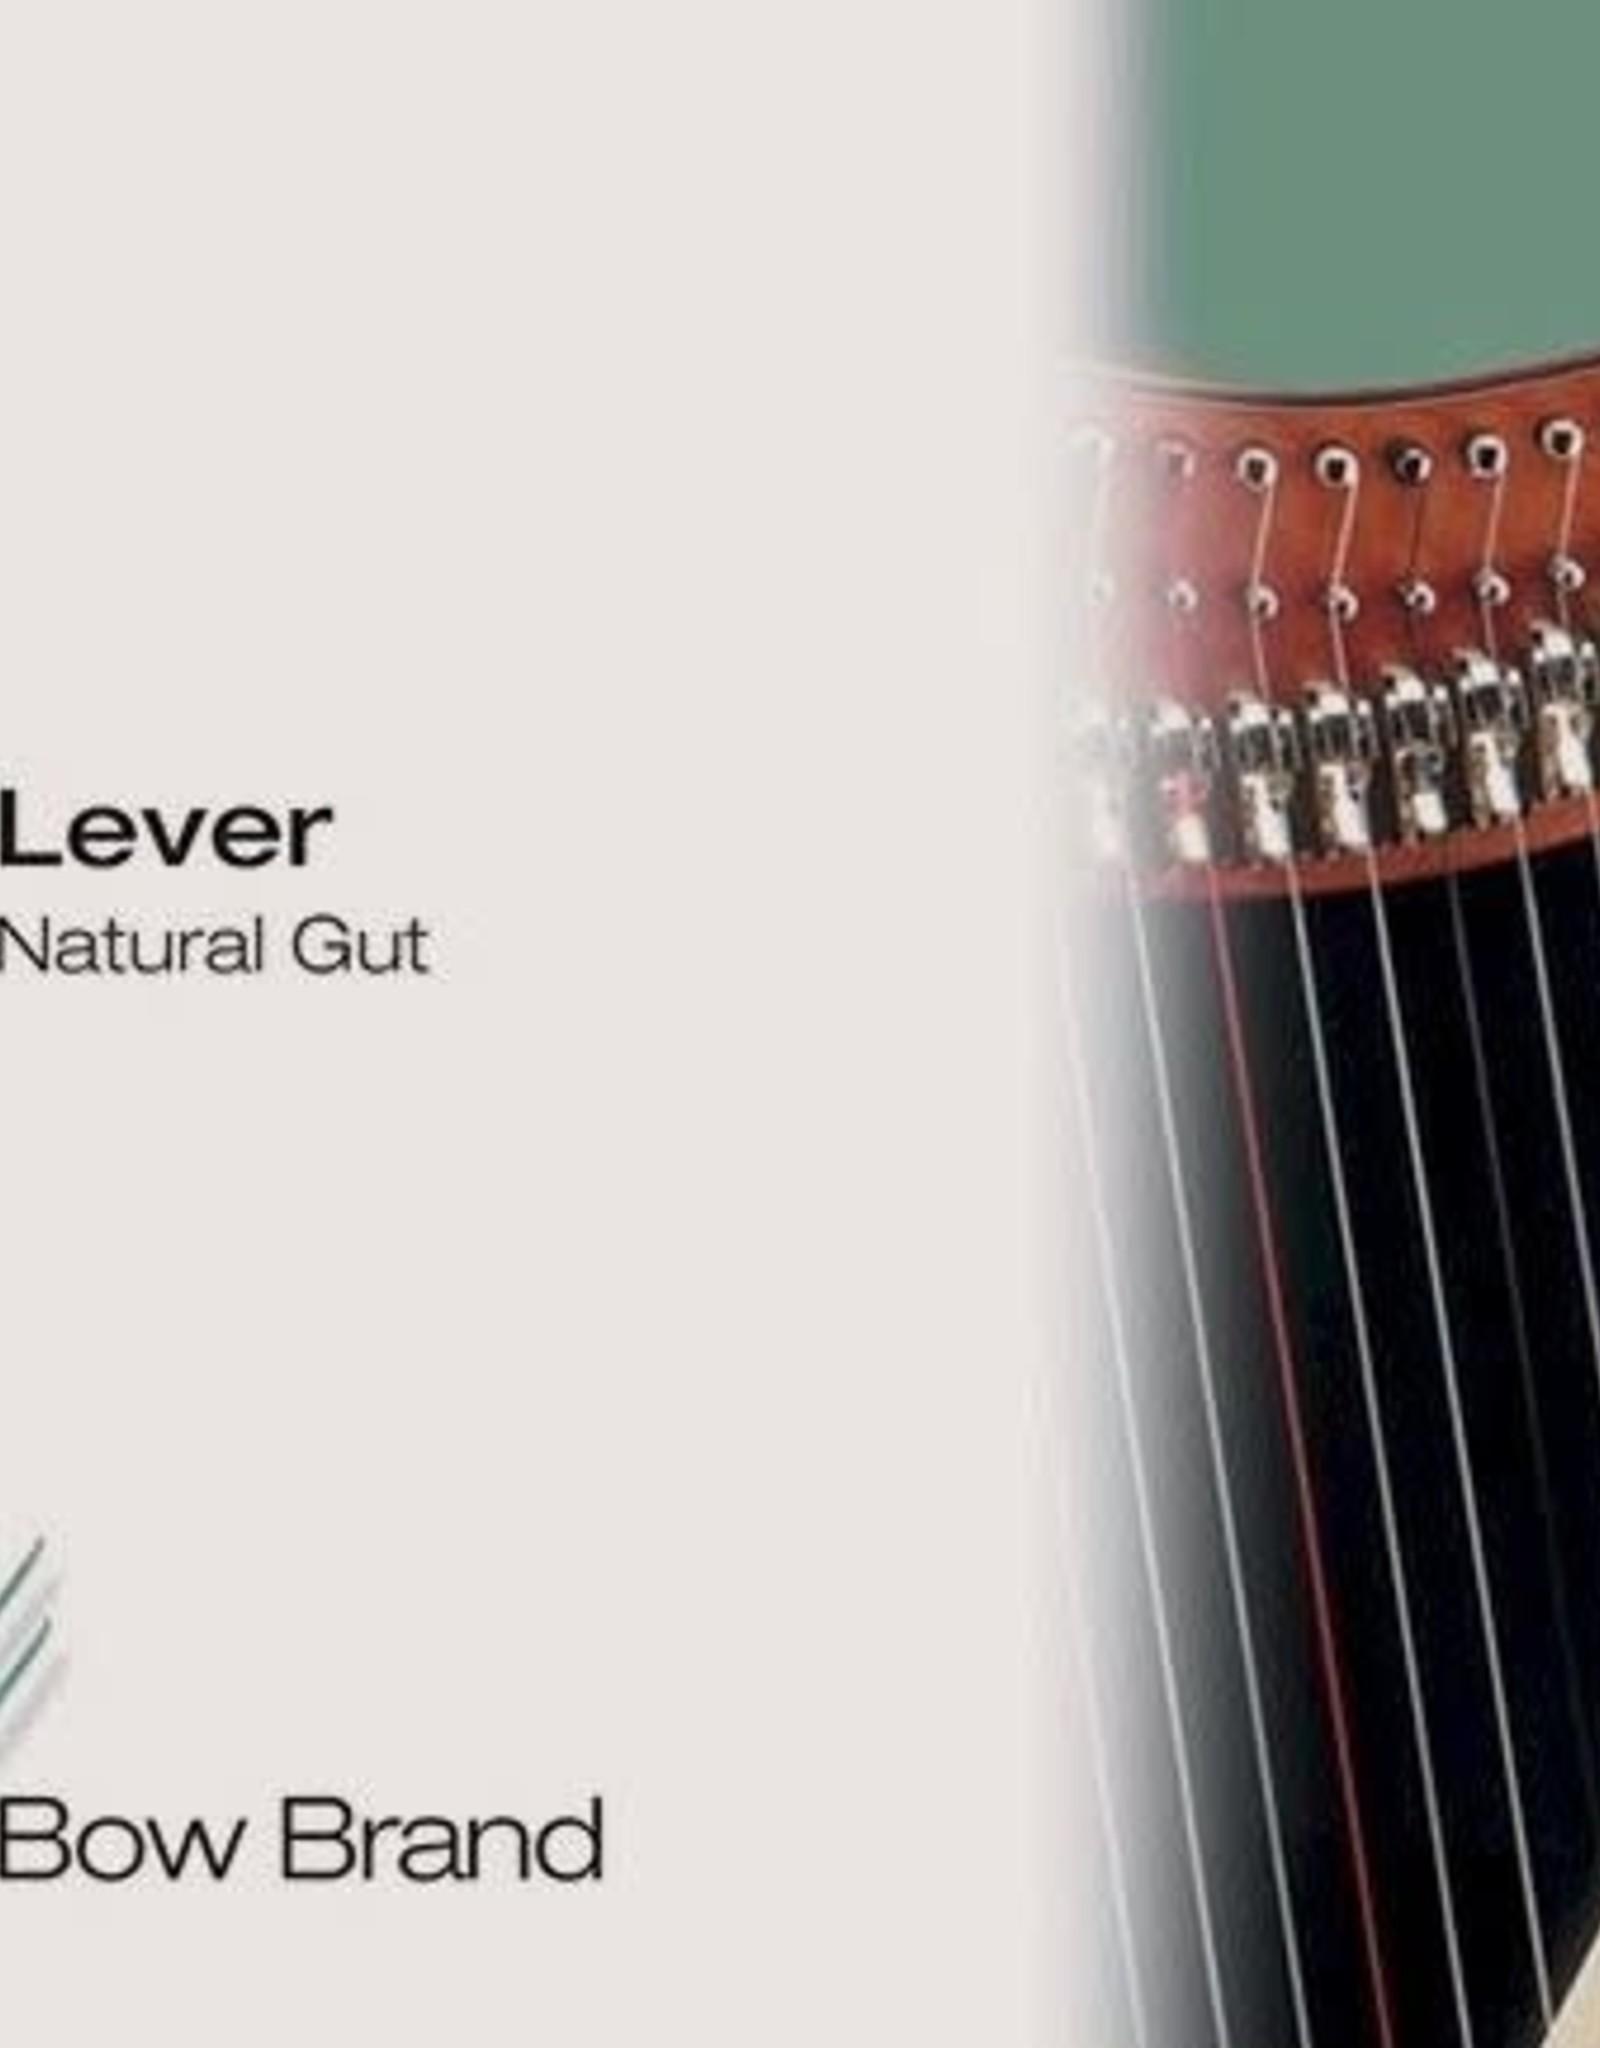 BOW BRAND  klep darm - lever GUT 6/1 sol